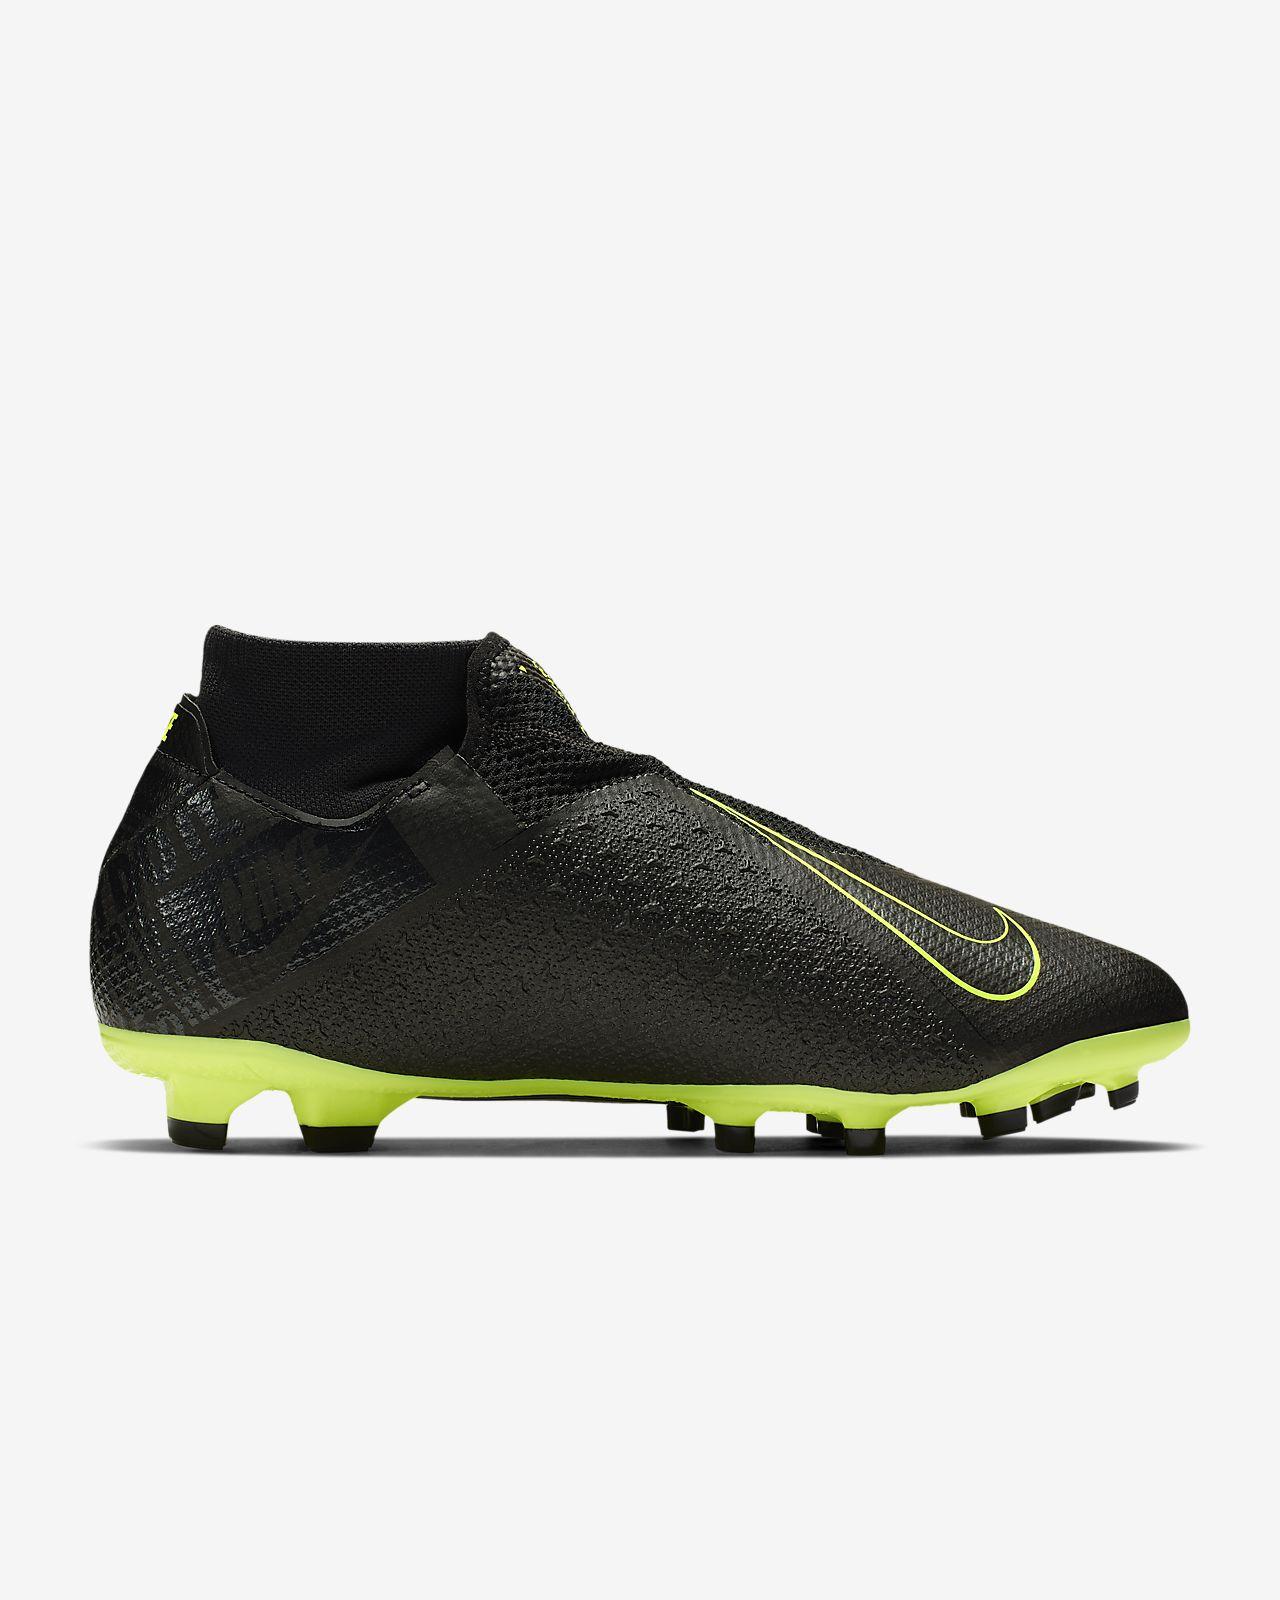 brand new 99e40 f8ec6 Nike Phantom Vision Pro Dynamic Fit FG Firm-Ground Soccer Cleat